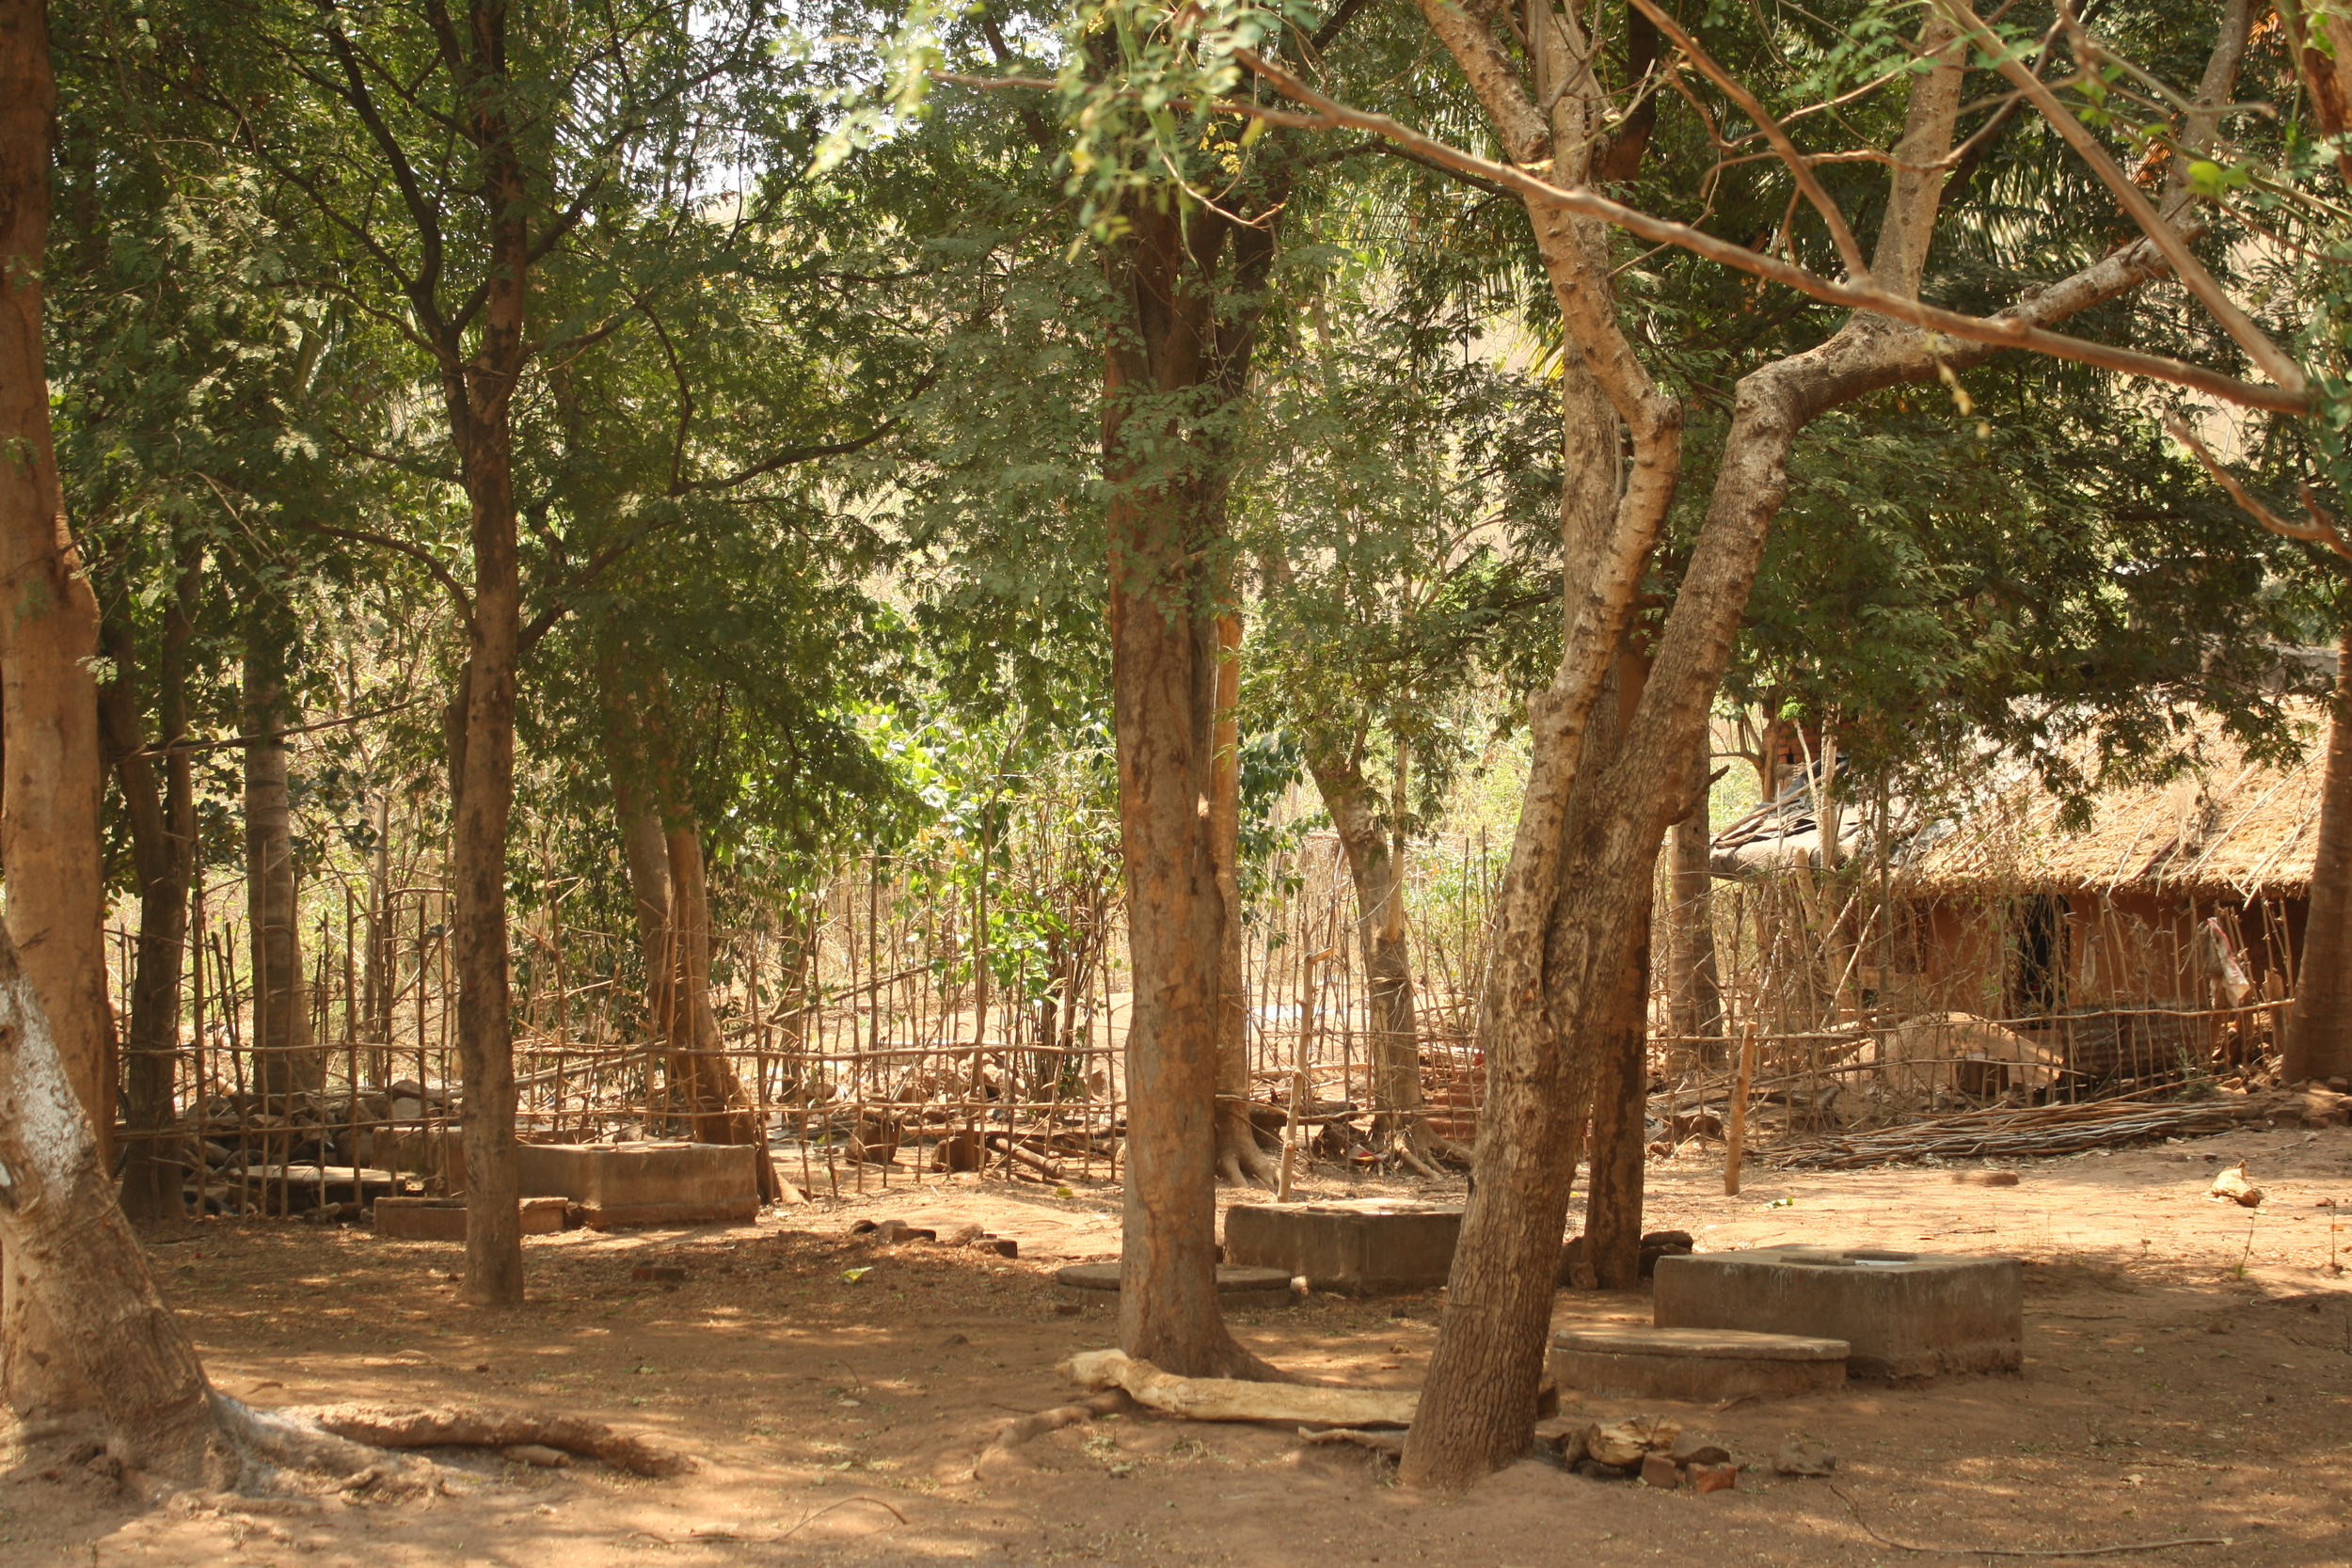 Odisha 'toilet graveyard', unfinished govt toilets April 2013. Credit: Praveena Sridhar